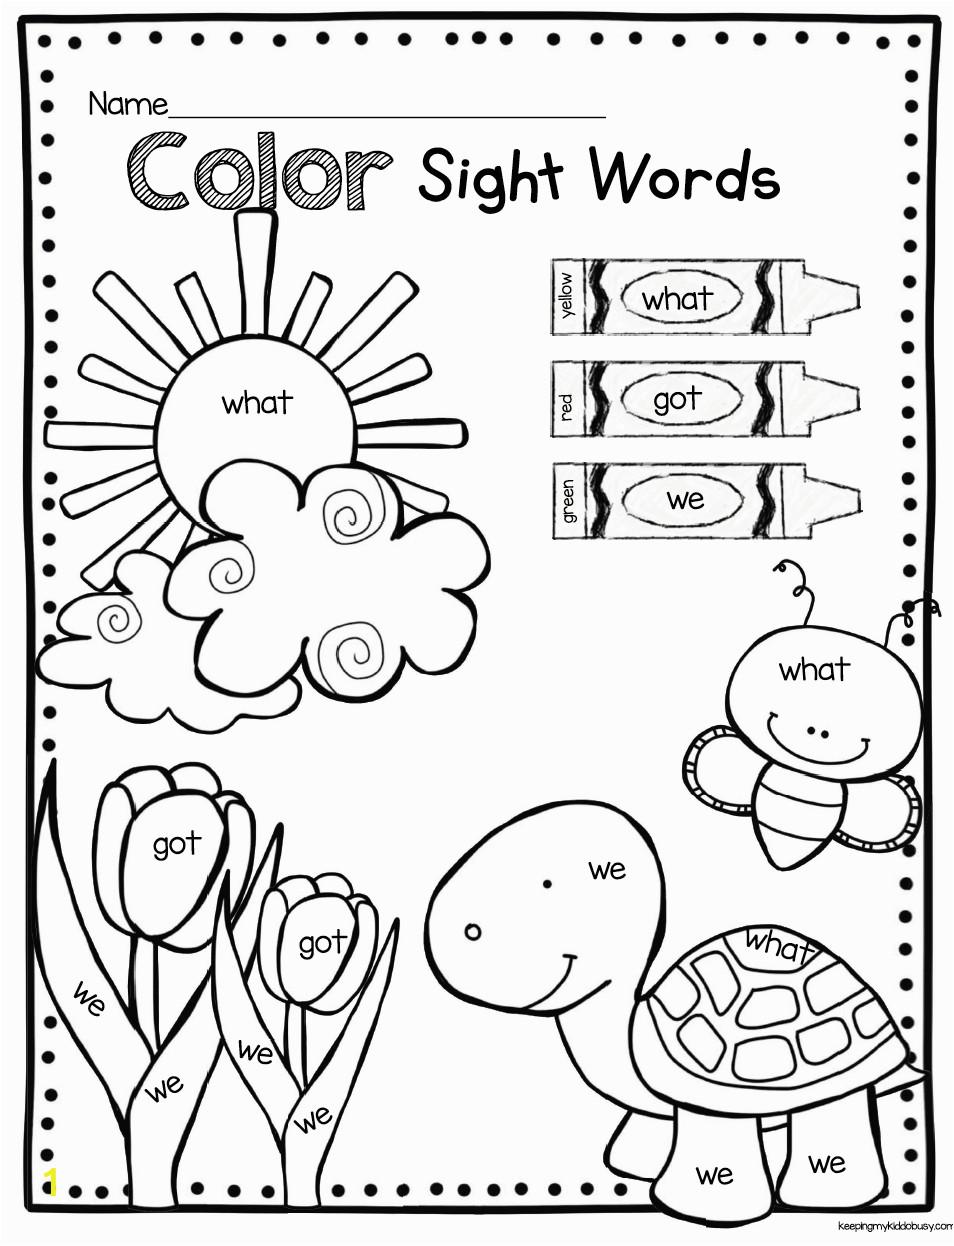 1012 color by sight word kindergarten